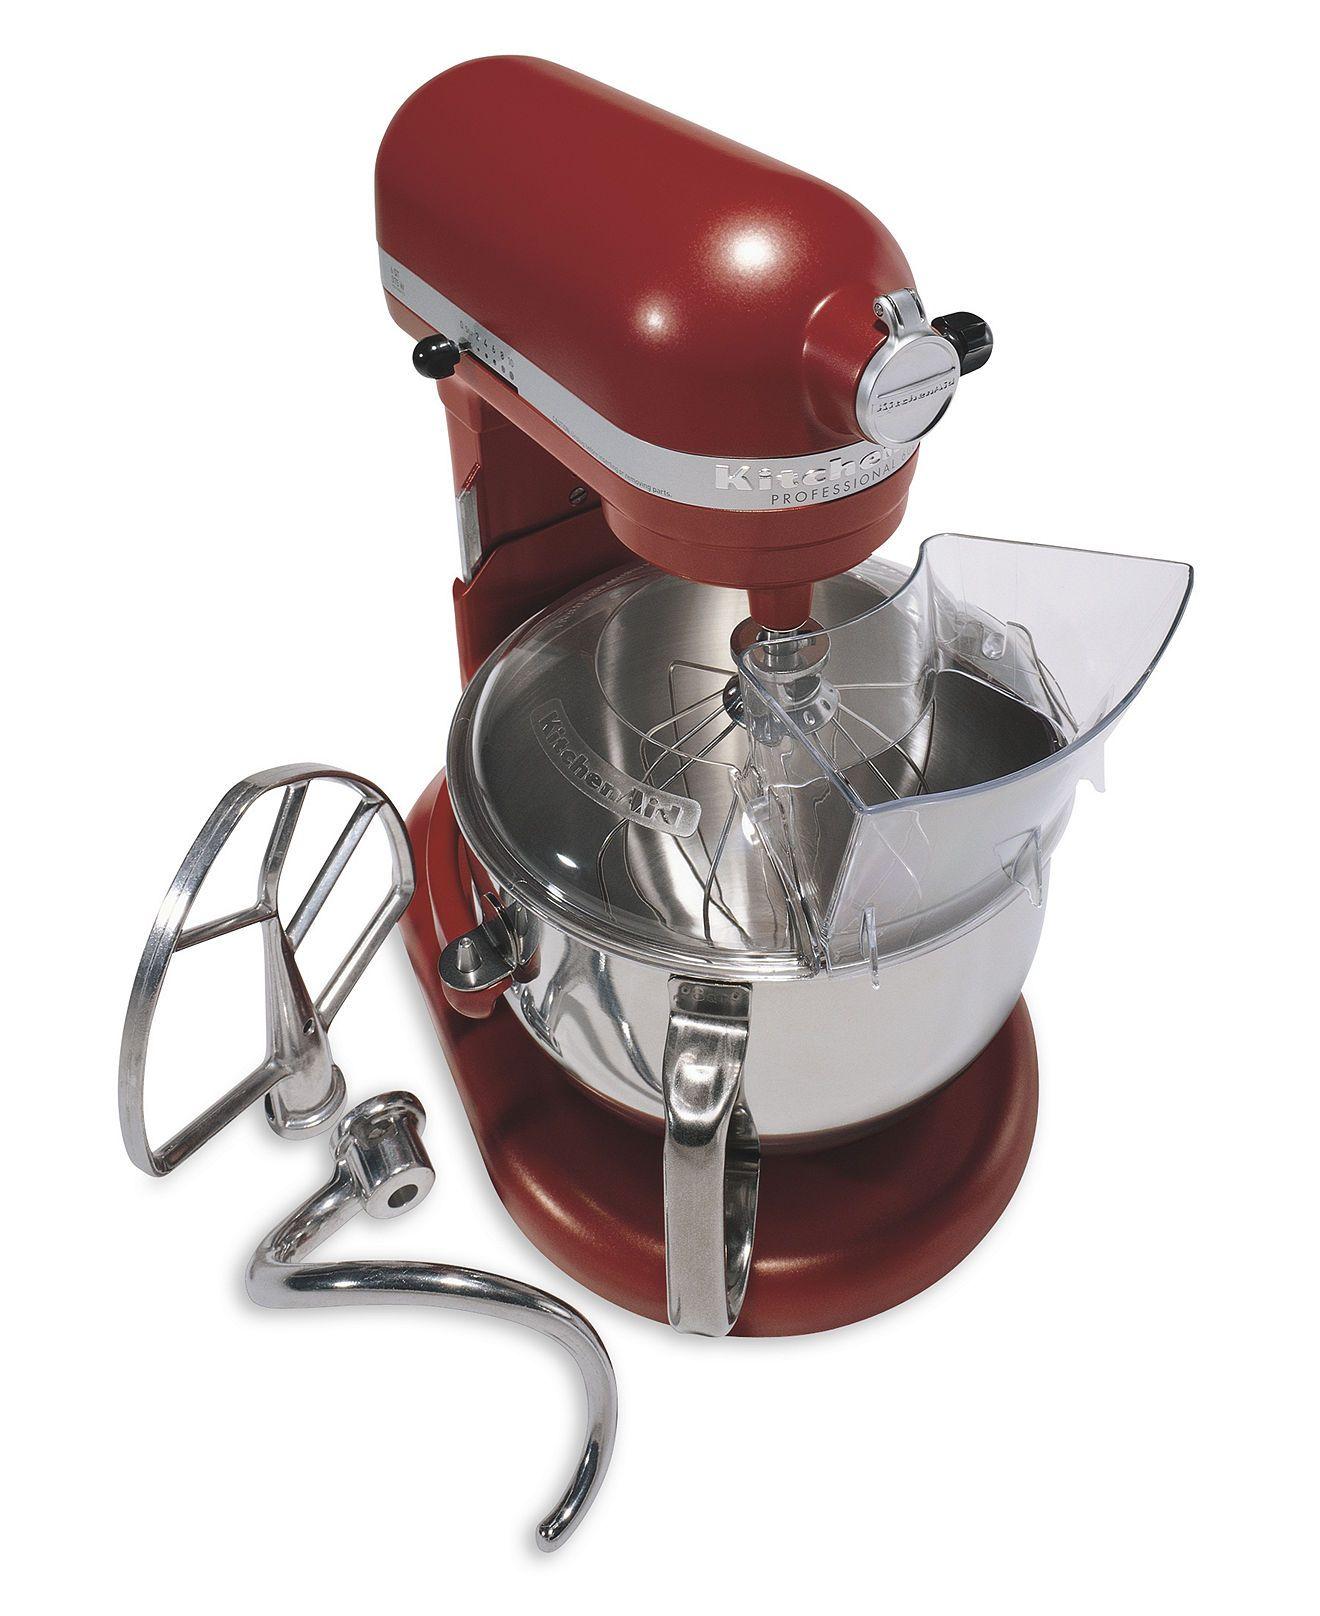 Kitchenaid 6 quart professional 600 stand mixer in empire